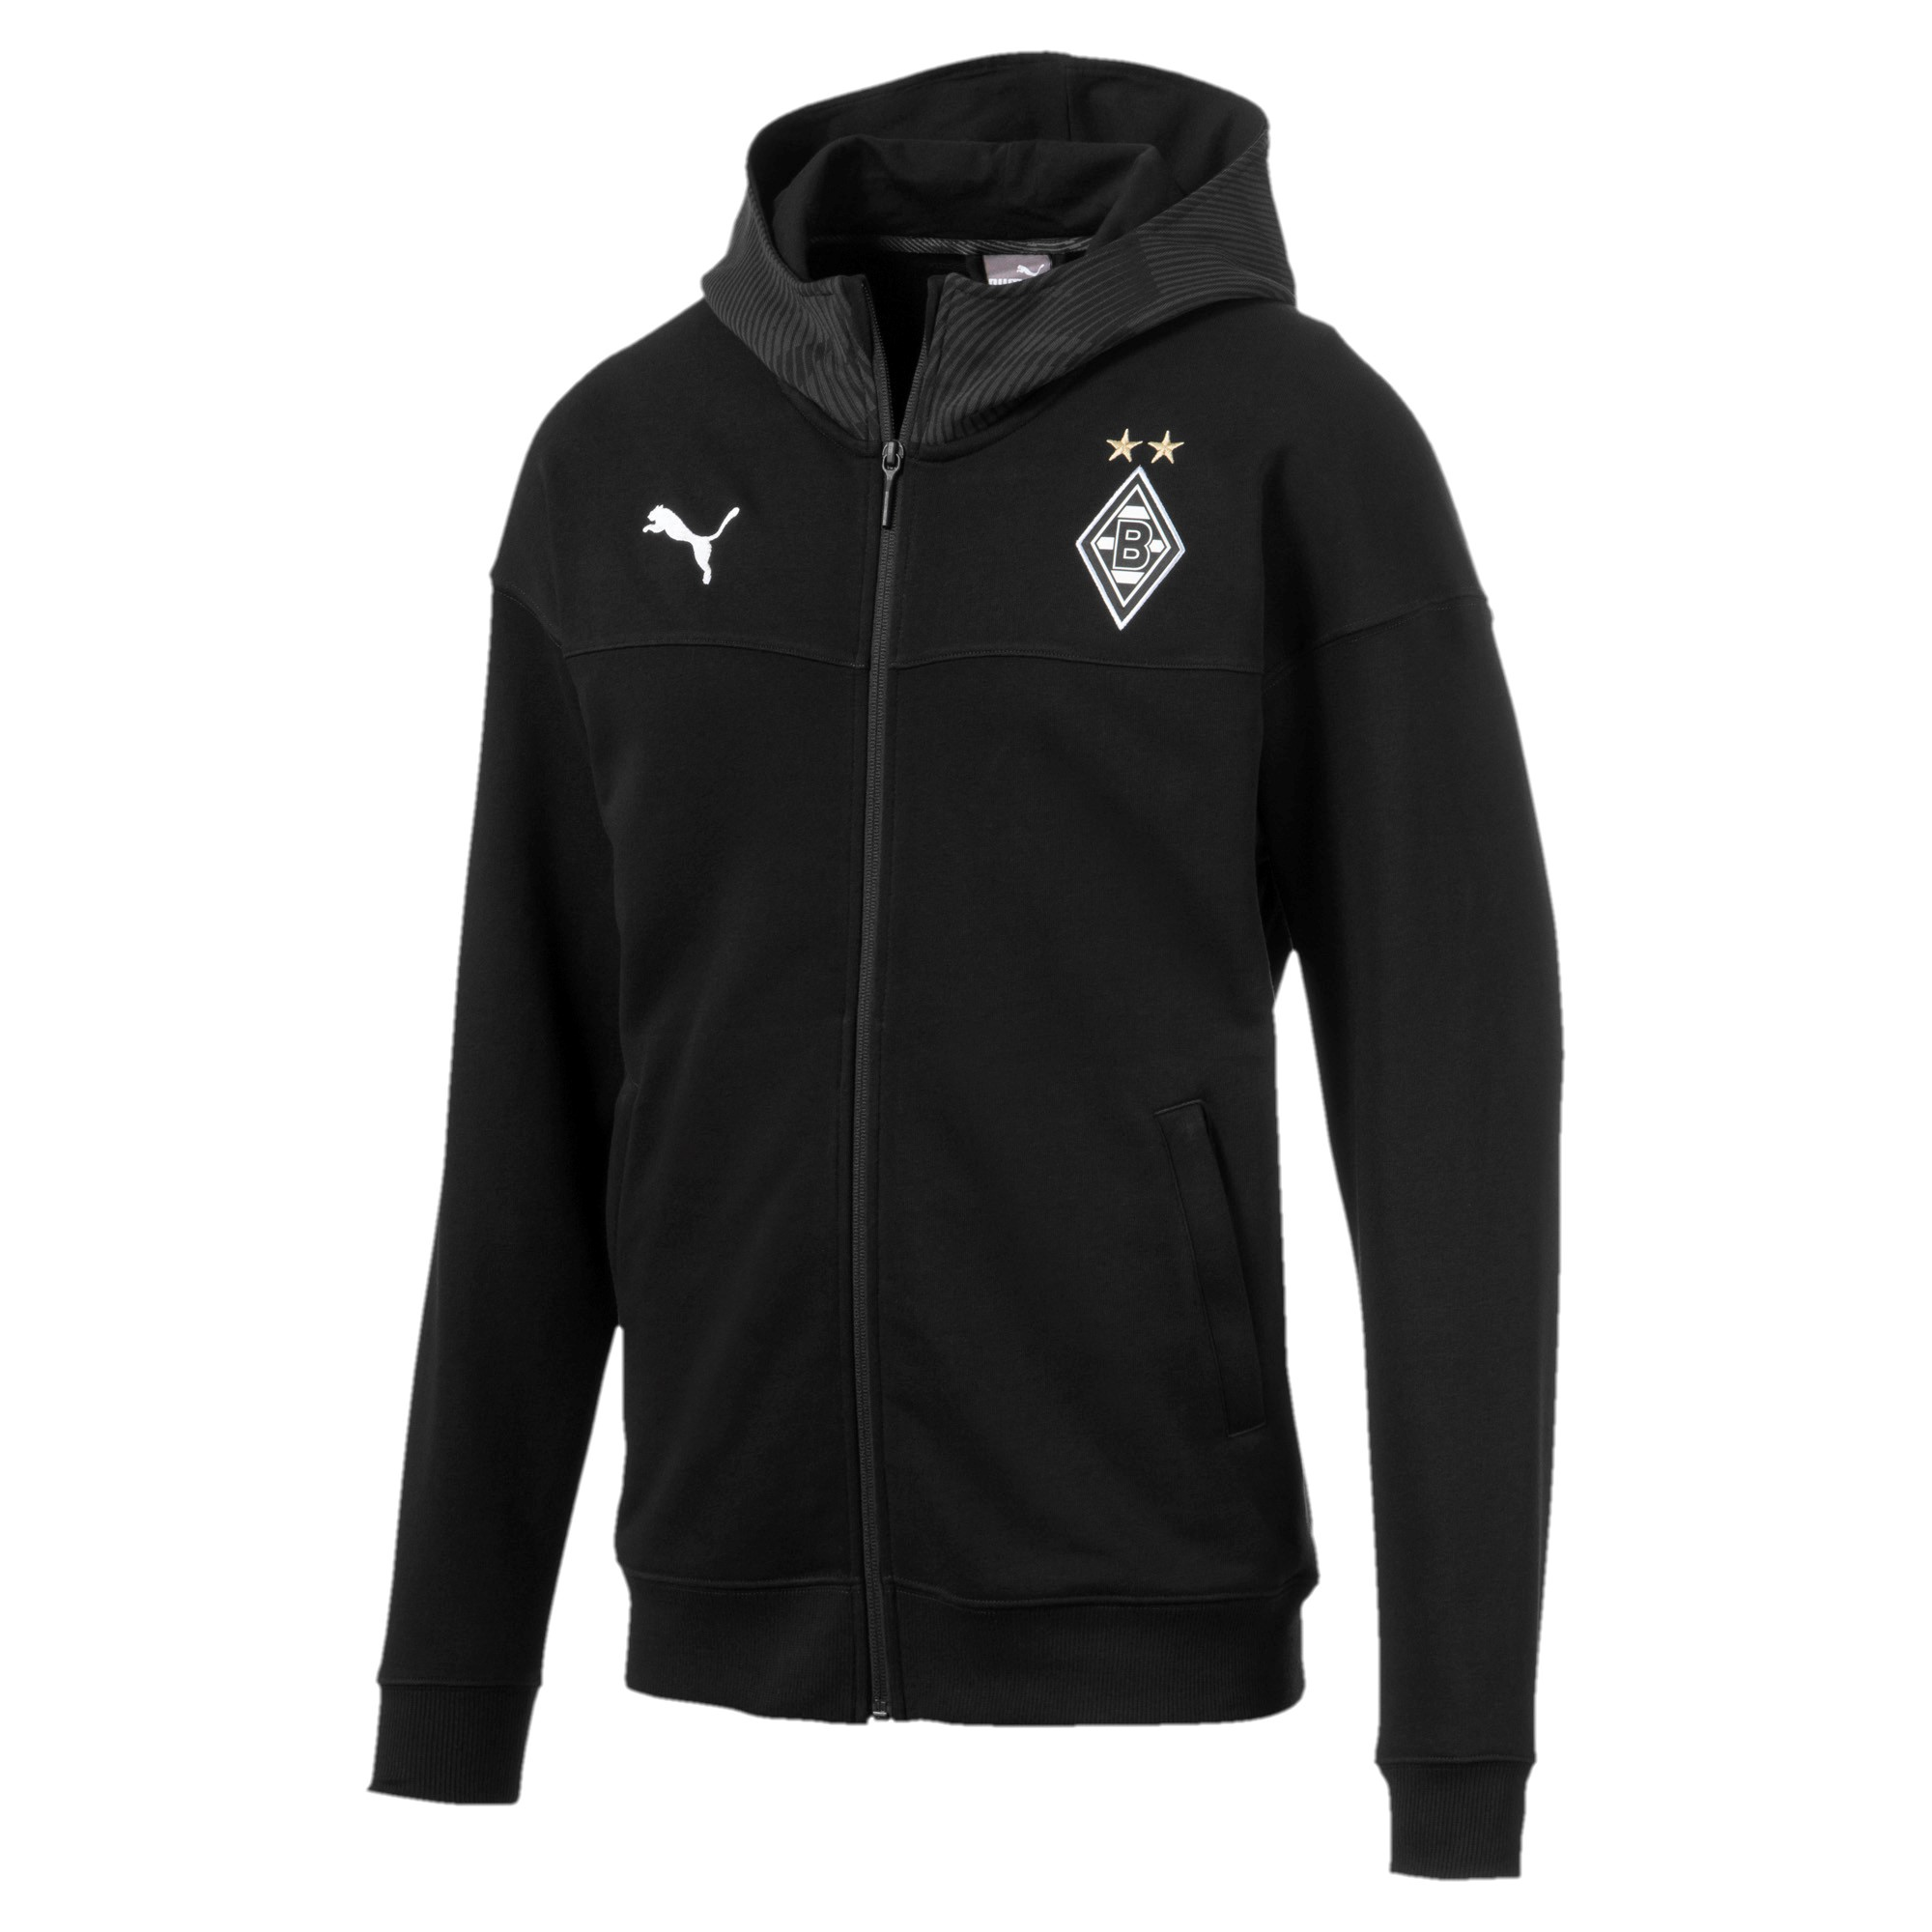 Puma BMG Borussia Mönchengladbach Herren Casuals Hooded Jacket Kapuzenjacke 756091 11 schwarz